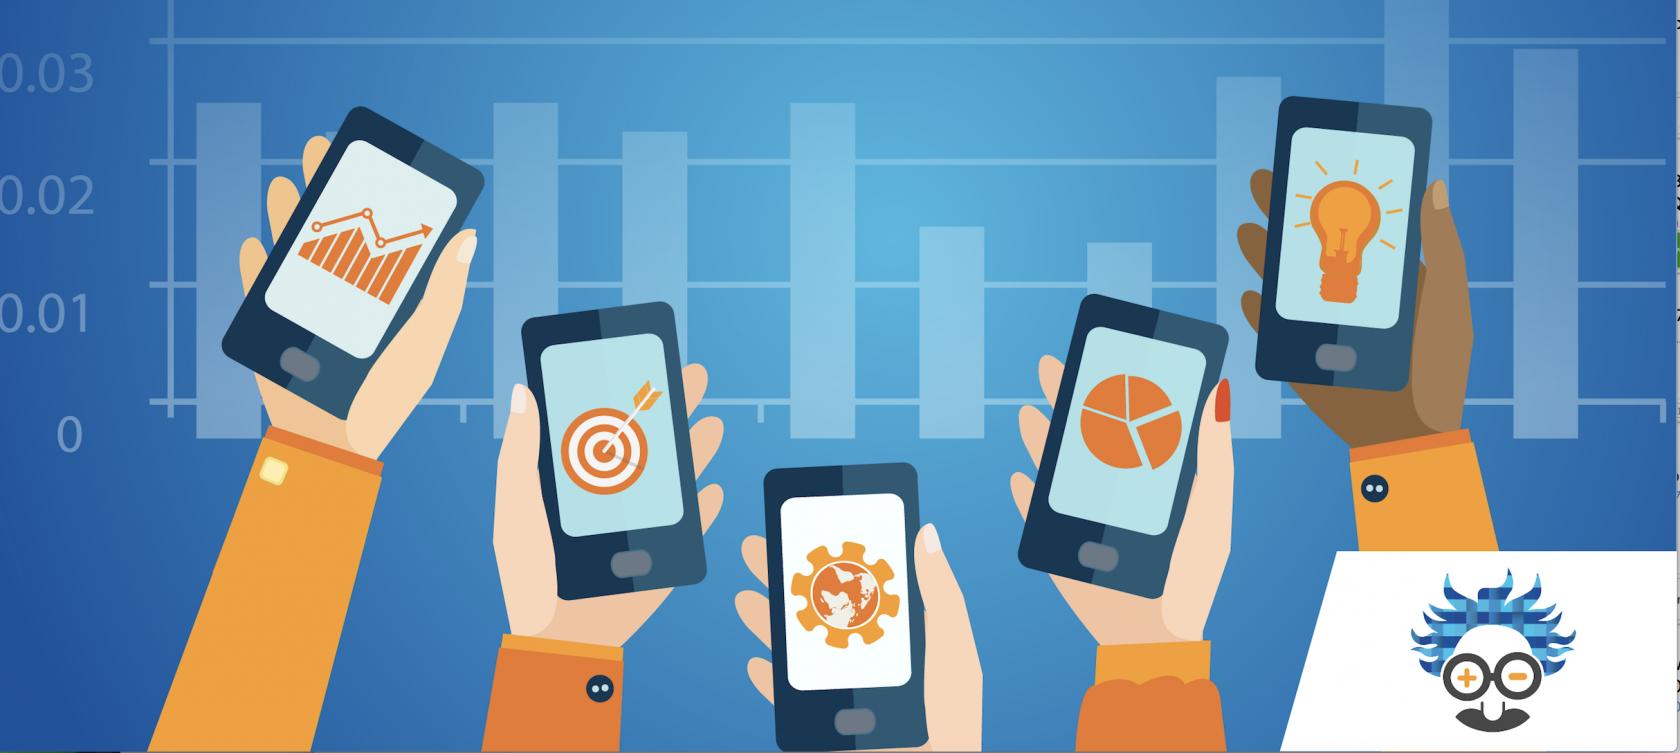 marketing apps